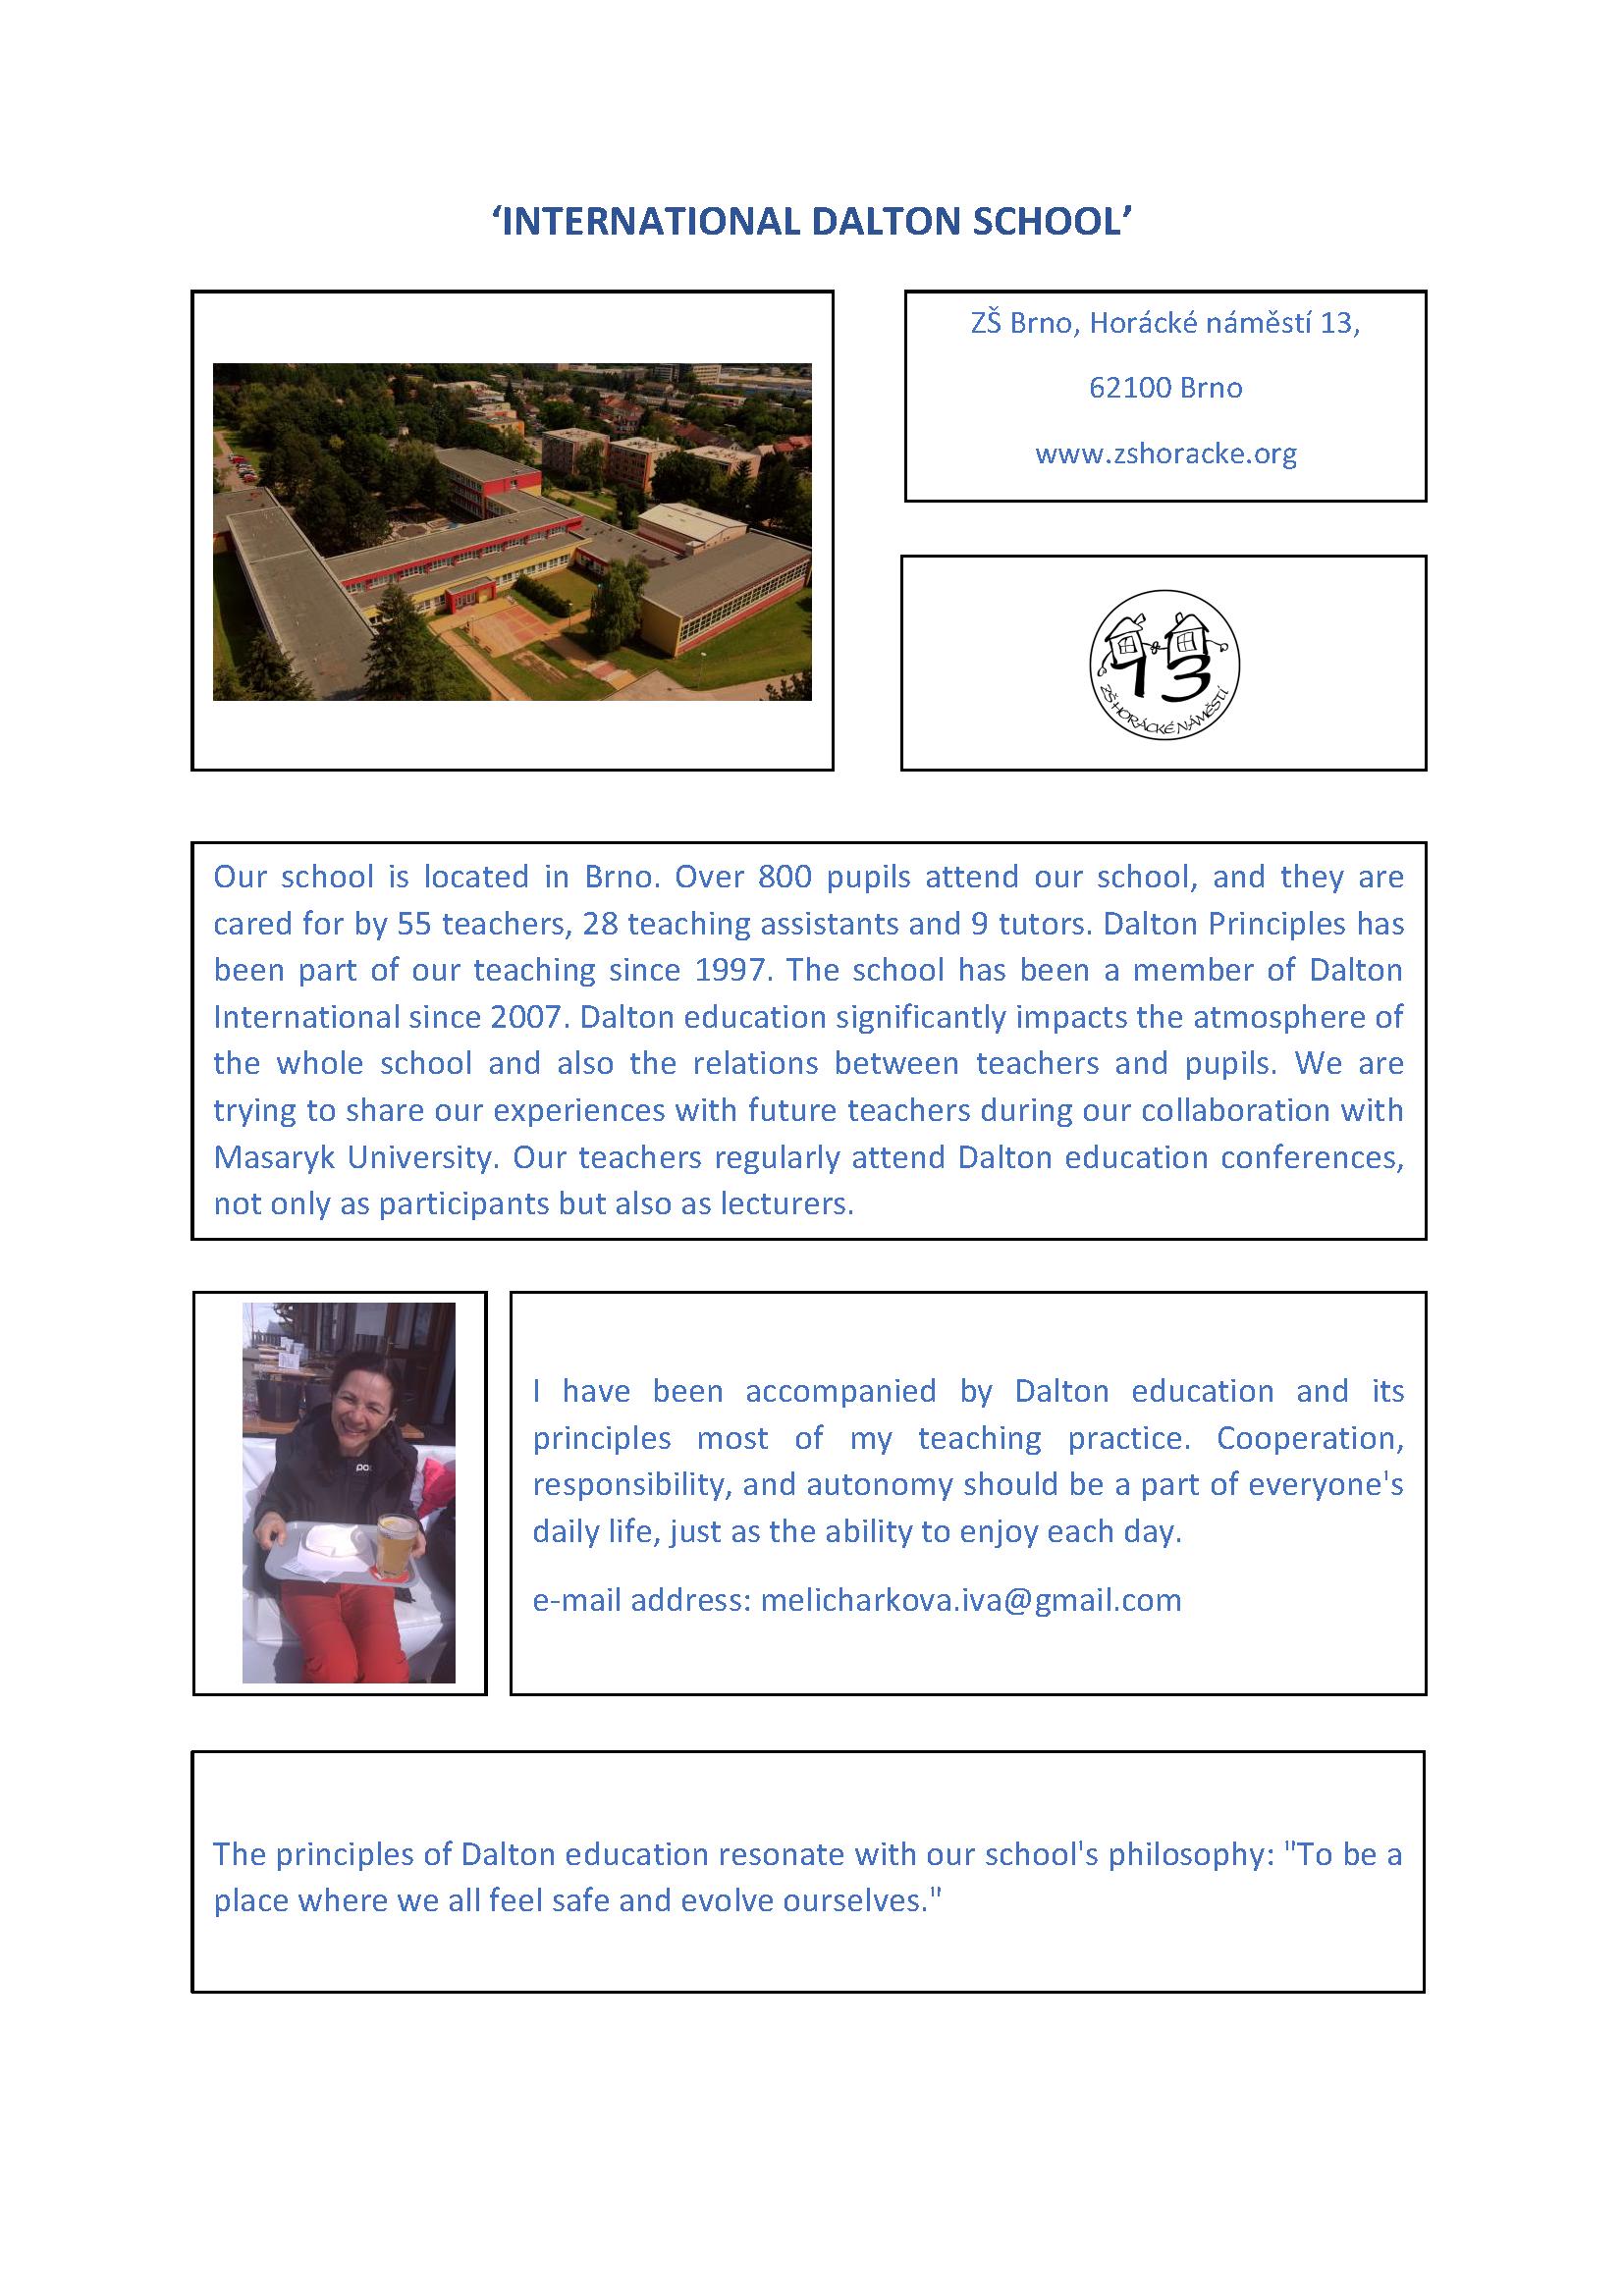 8. HORACKE NAMESTI DALTON SCHOOL - INFO website DALTON INT-2